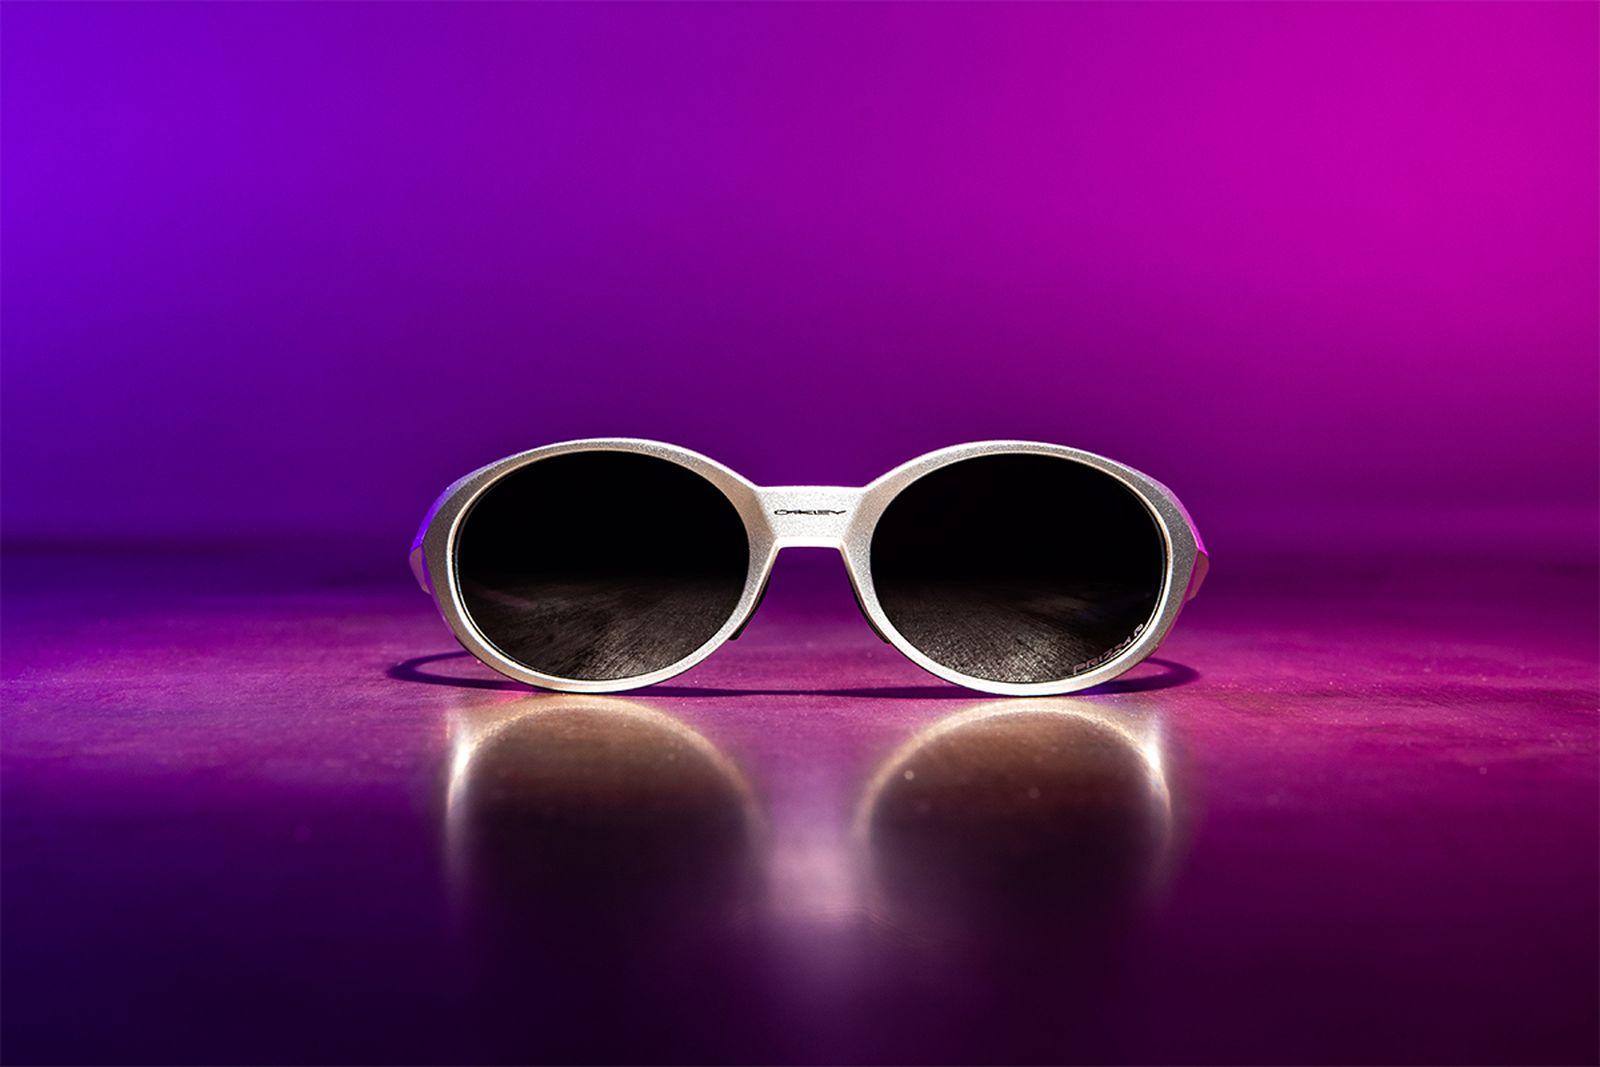 Oakley oakley prizm sunglasses